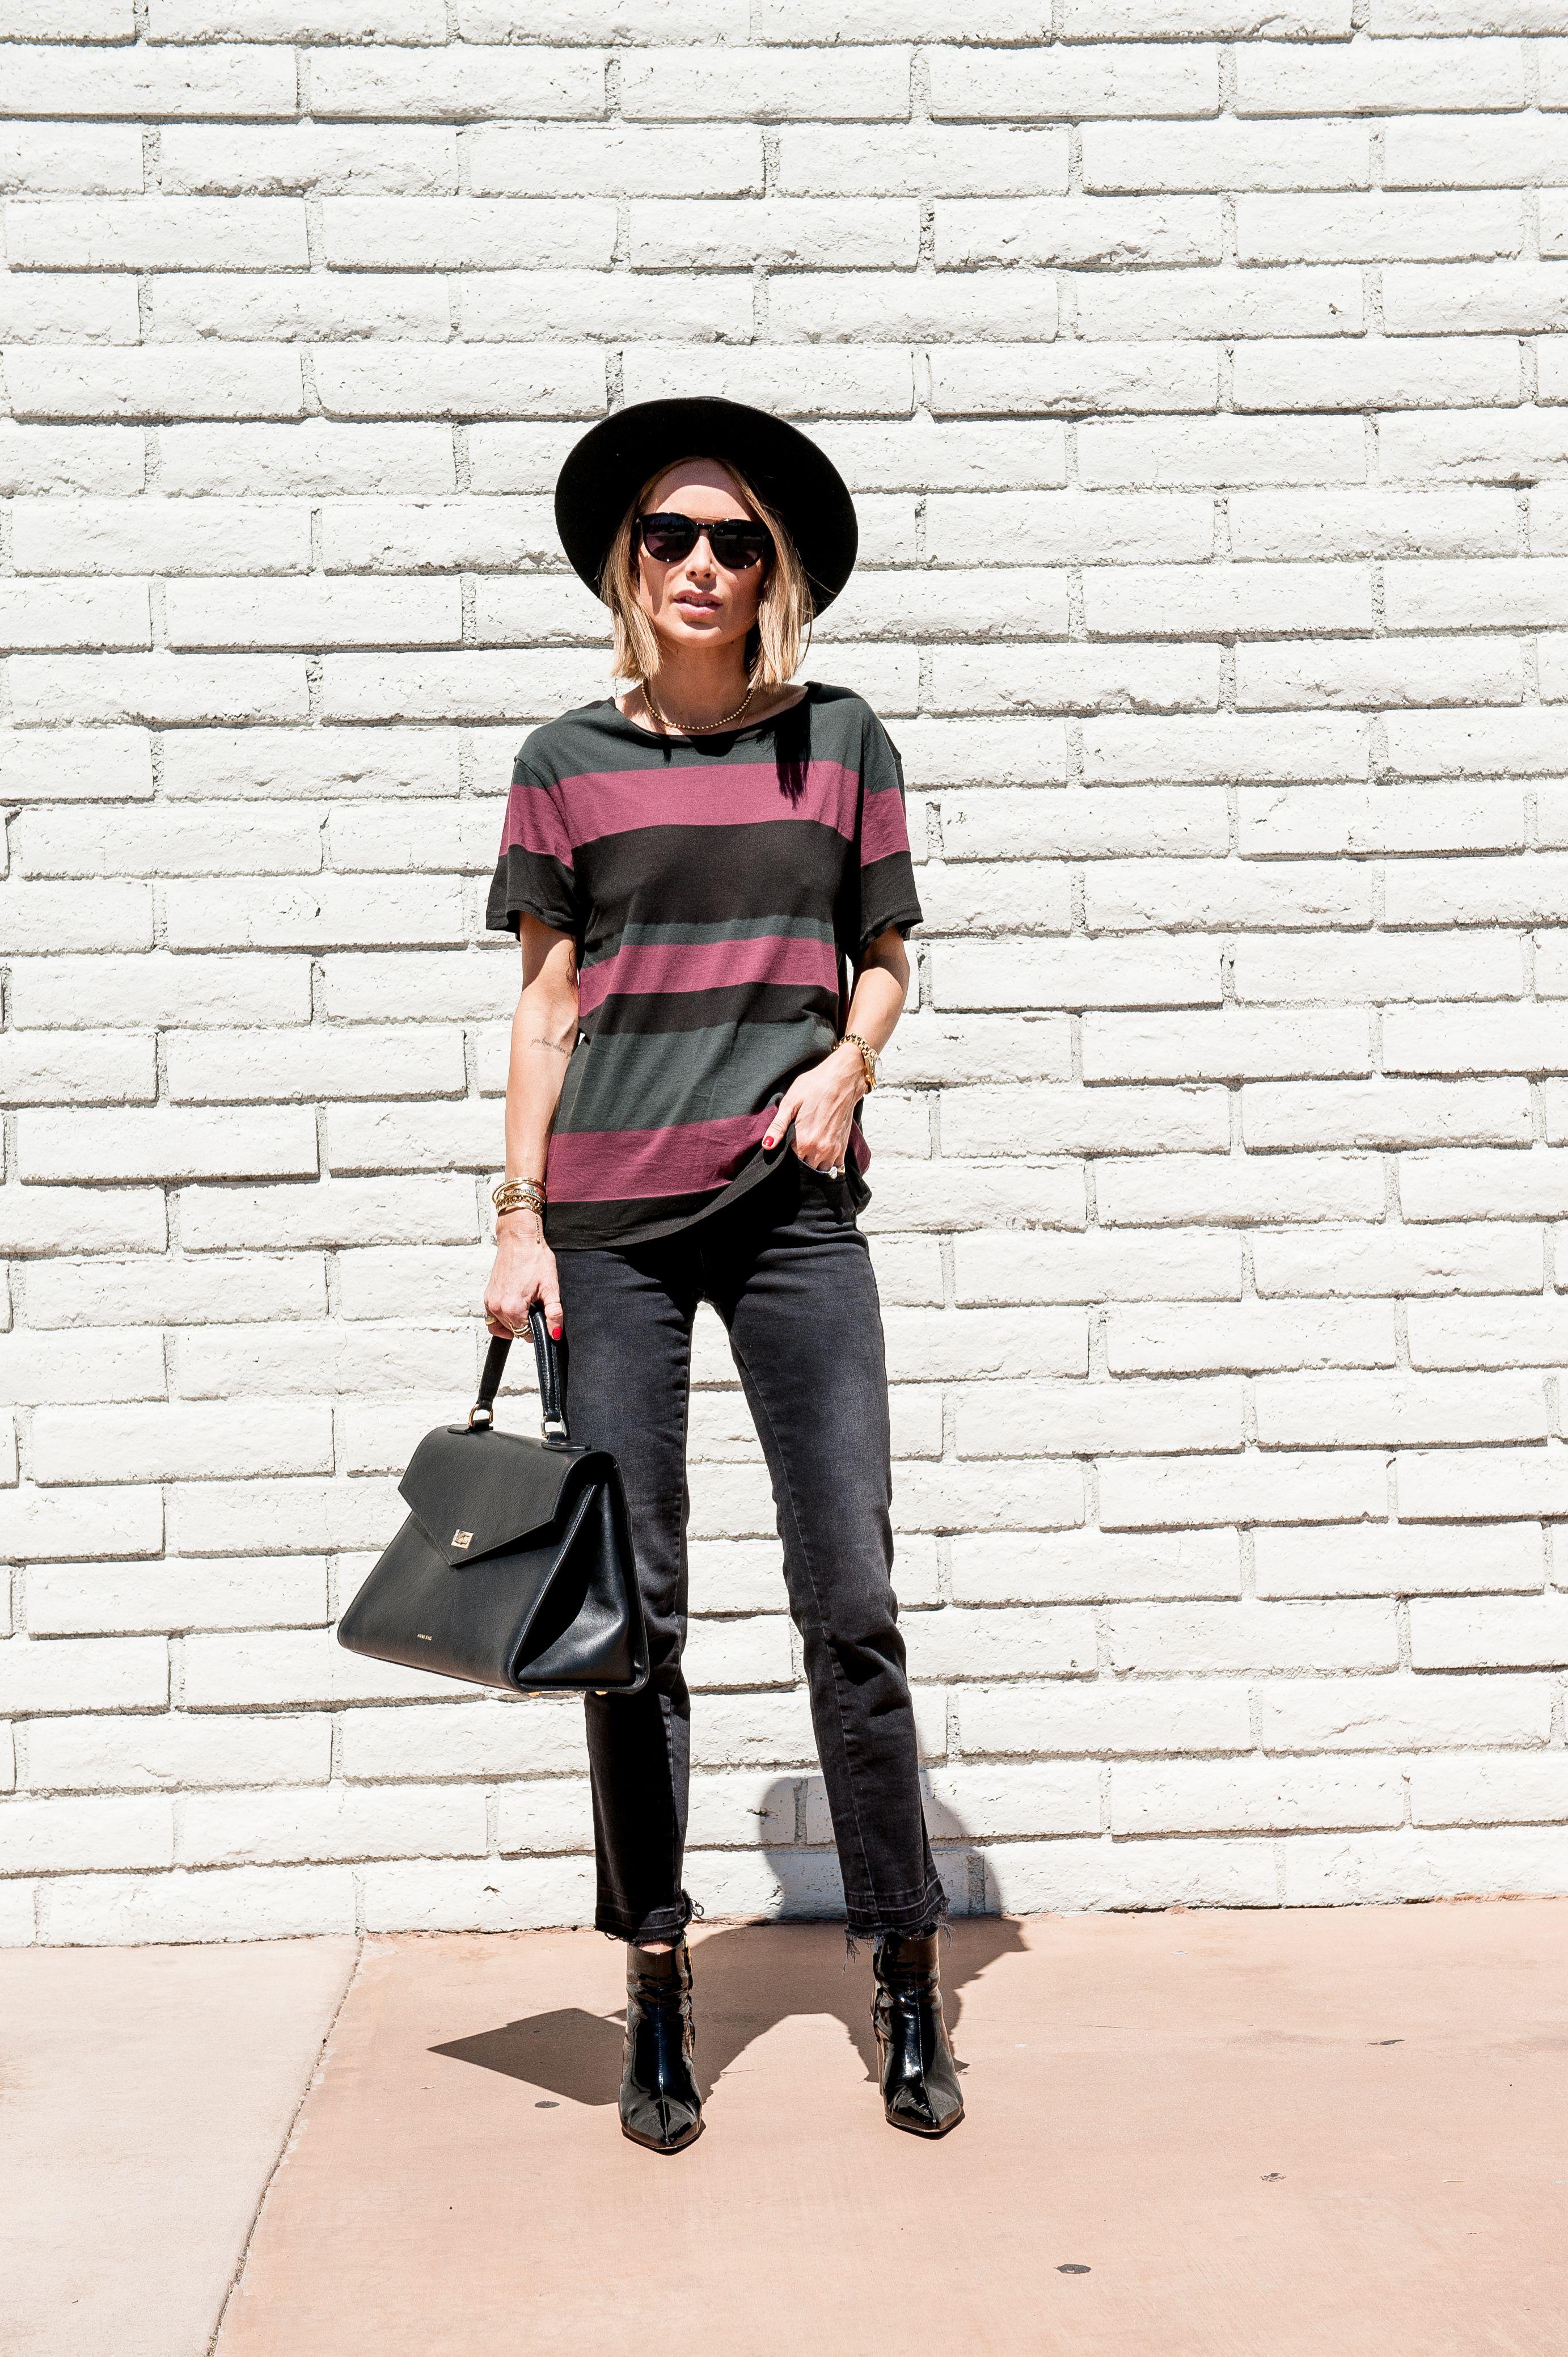 Hem Berlin anine striped t shirt anine berlin sunglasses anine